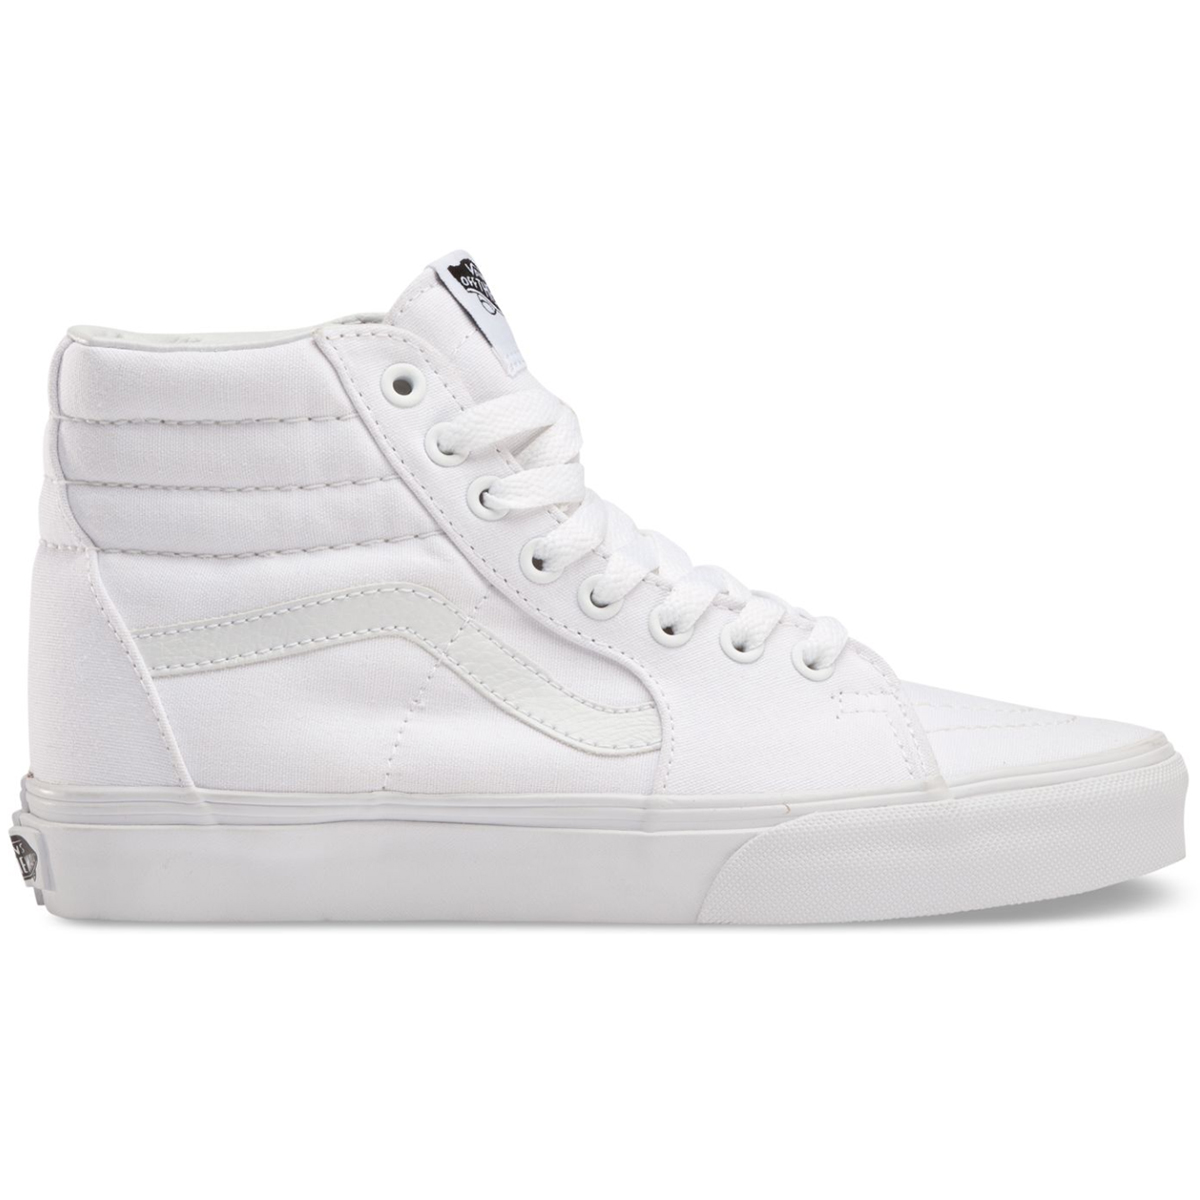 Vans Men's Sk8-Hi Shoes - White, 10